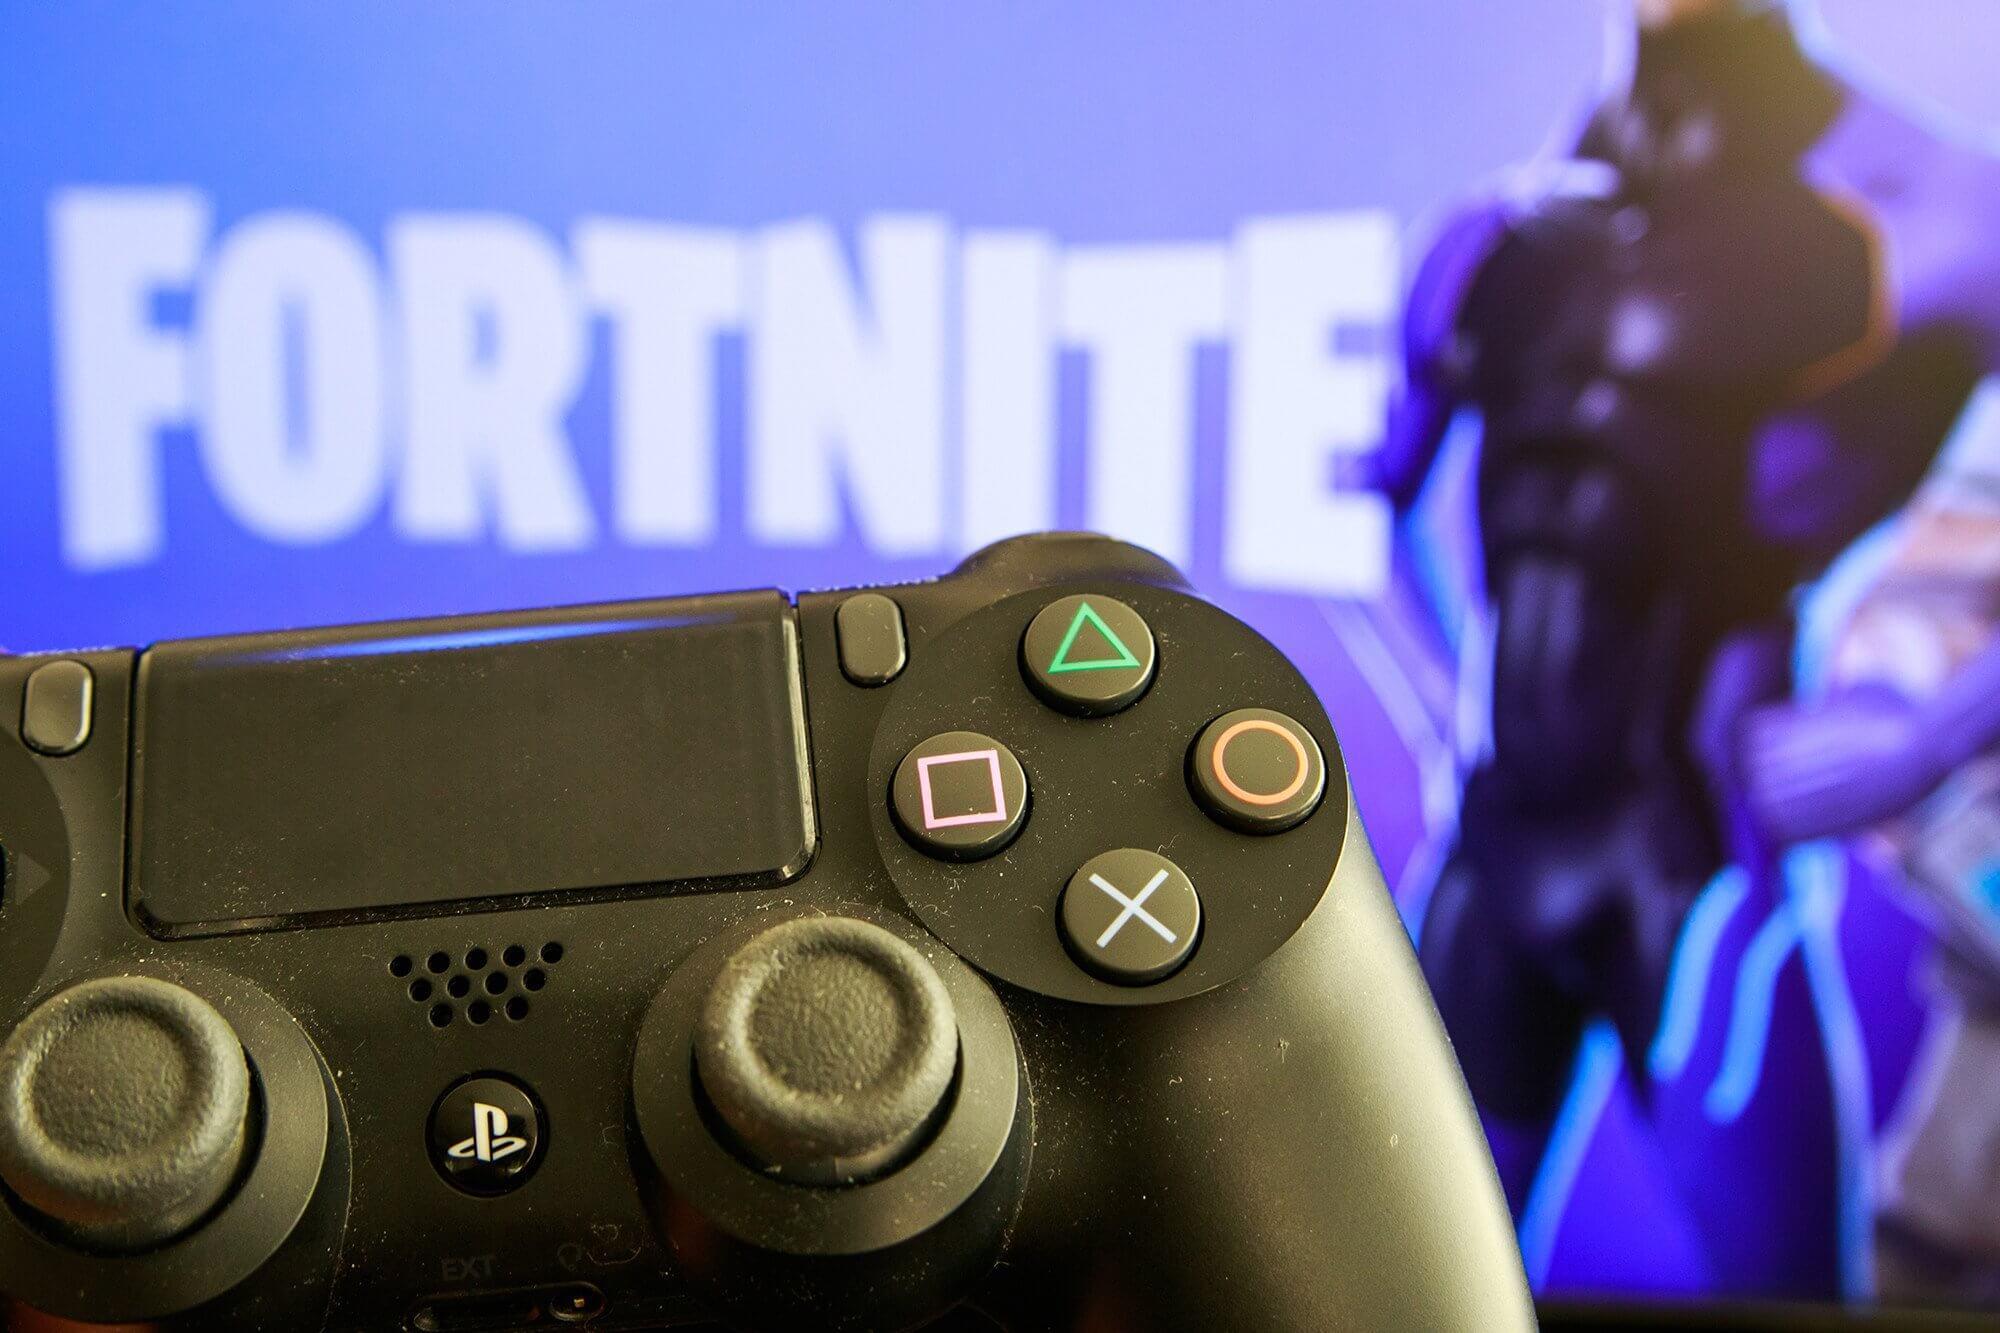 Fortnite Ödeme Krizine Kurban Gitti: Epic Games Bitcoin'i Gündeme Aldı 1 - Fortnite Odeme